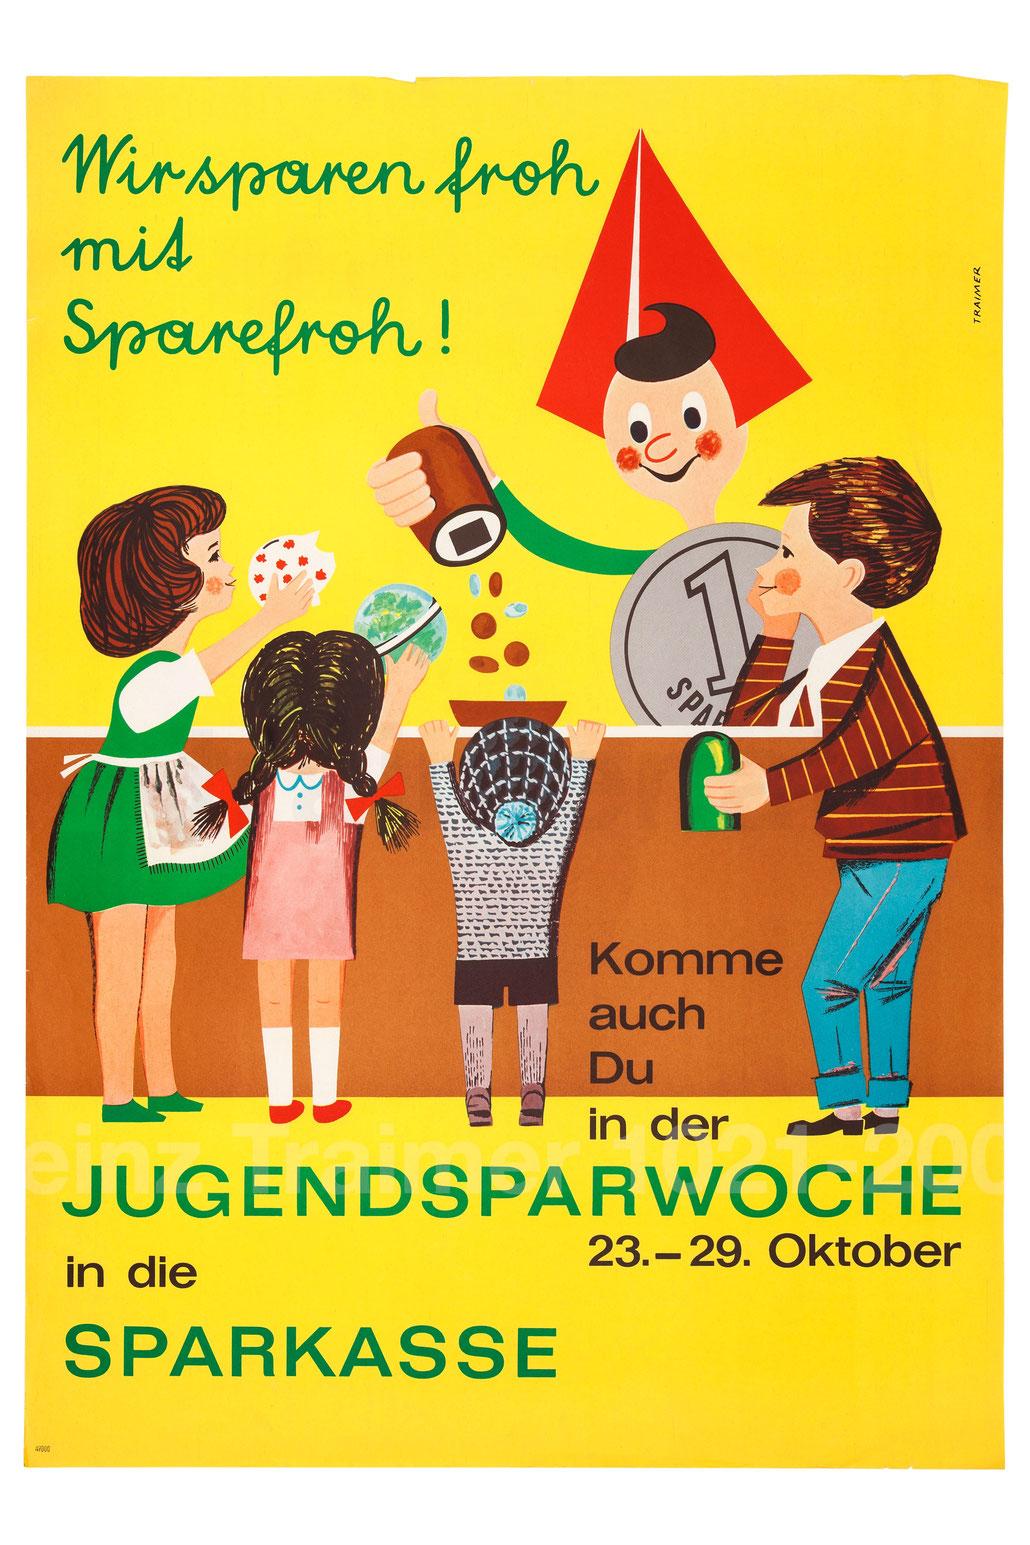 Weltspartagswerbung Plakat Poster mit Sparefroh um 1960